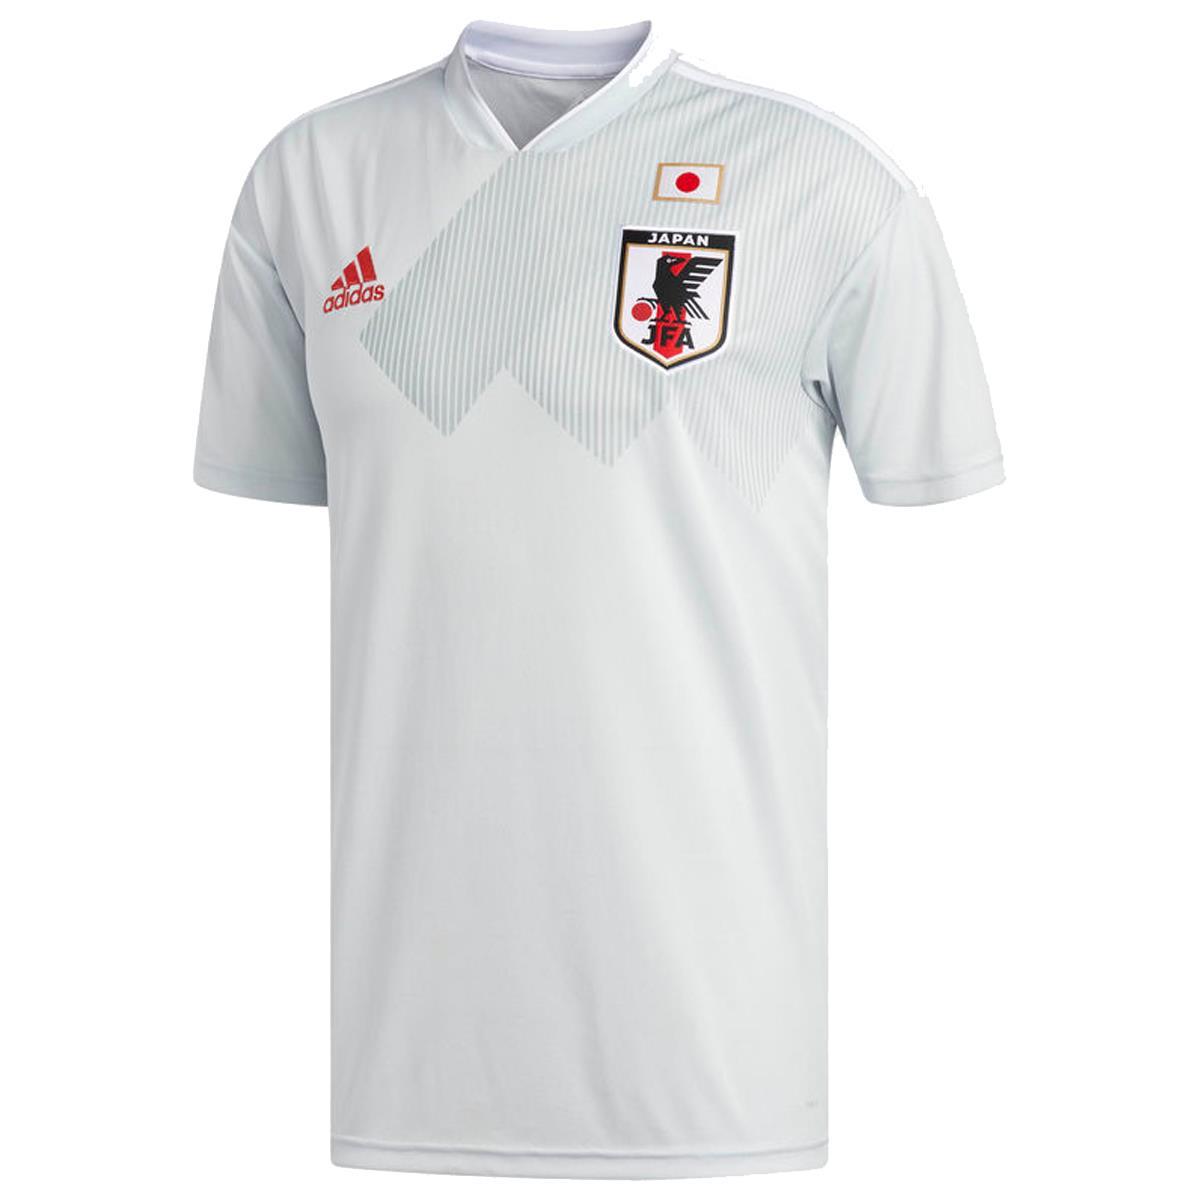 1426e707b Camisa Adidas Torcedor Japão II 2018 Masculina